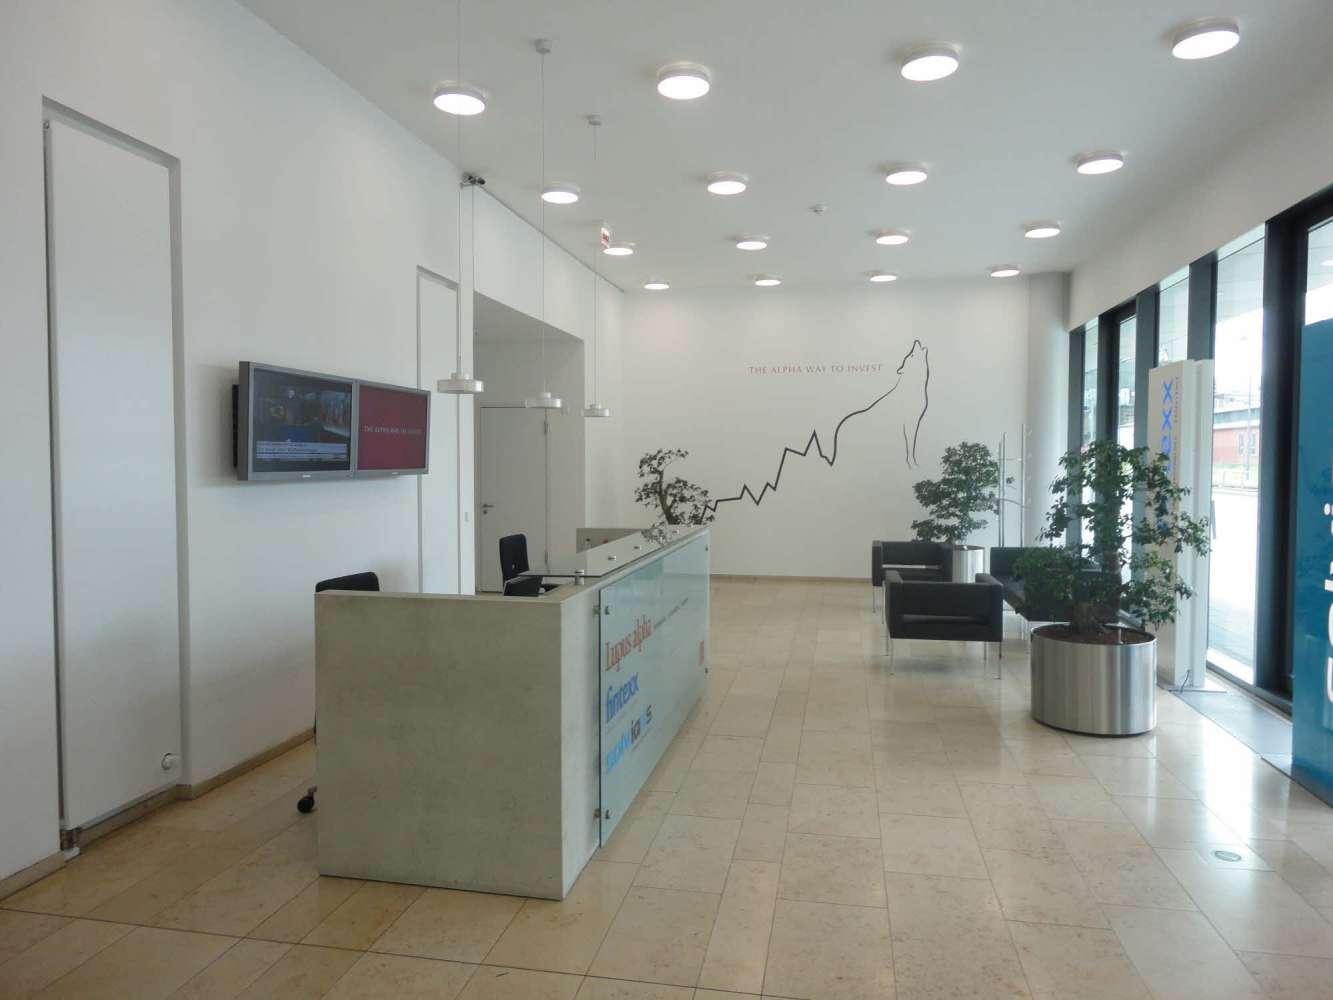 Büros Frankfurt am main, 60327 - Büro - Frankfurt am Main, Gutleutviertel - F0827 - 10542693